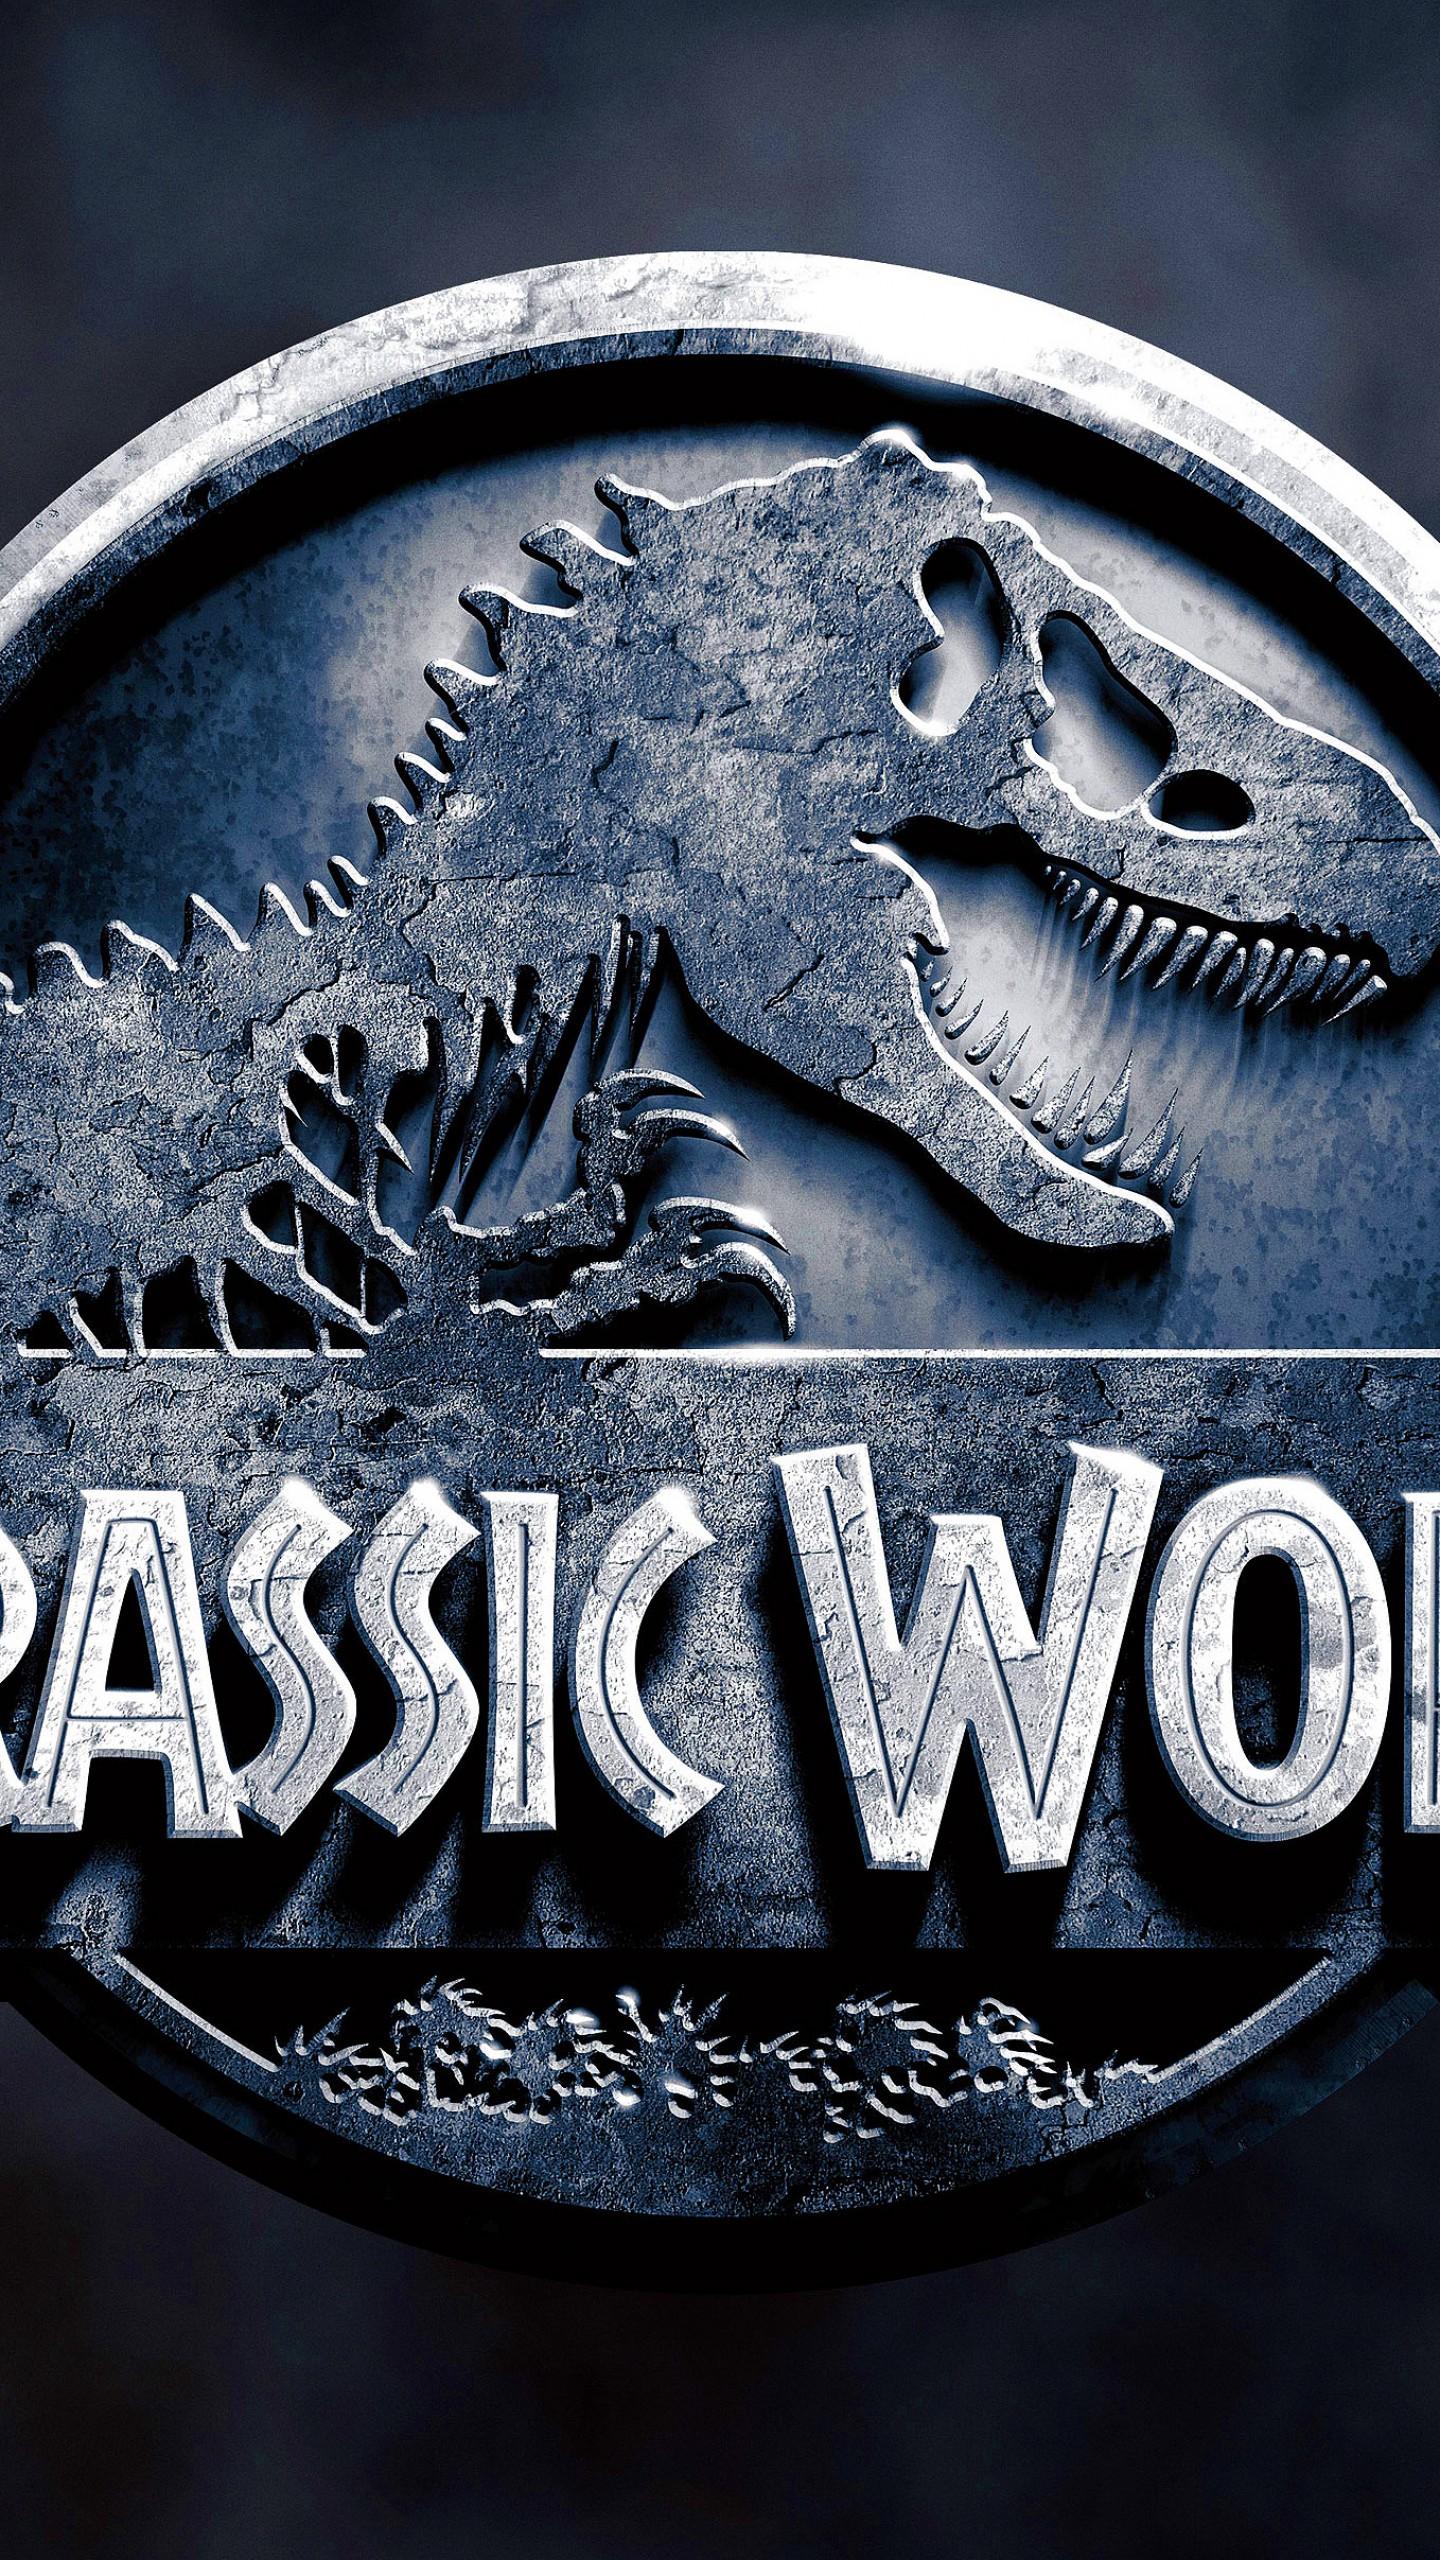 Wallpaper Jurassic World Best Movies Of 2015 Film Bryce